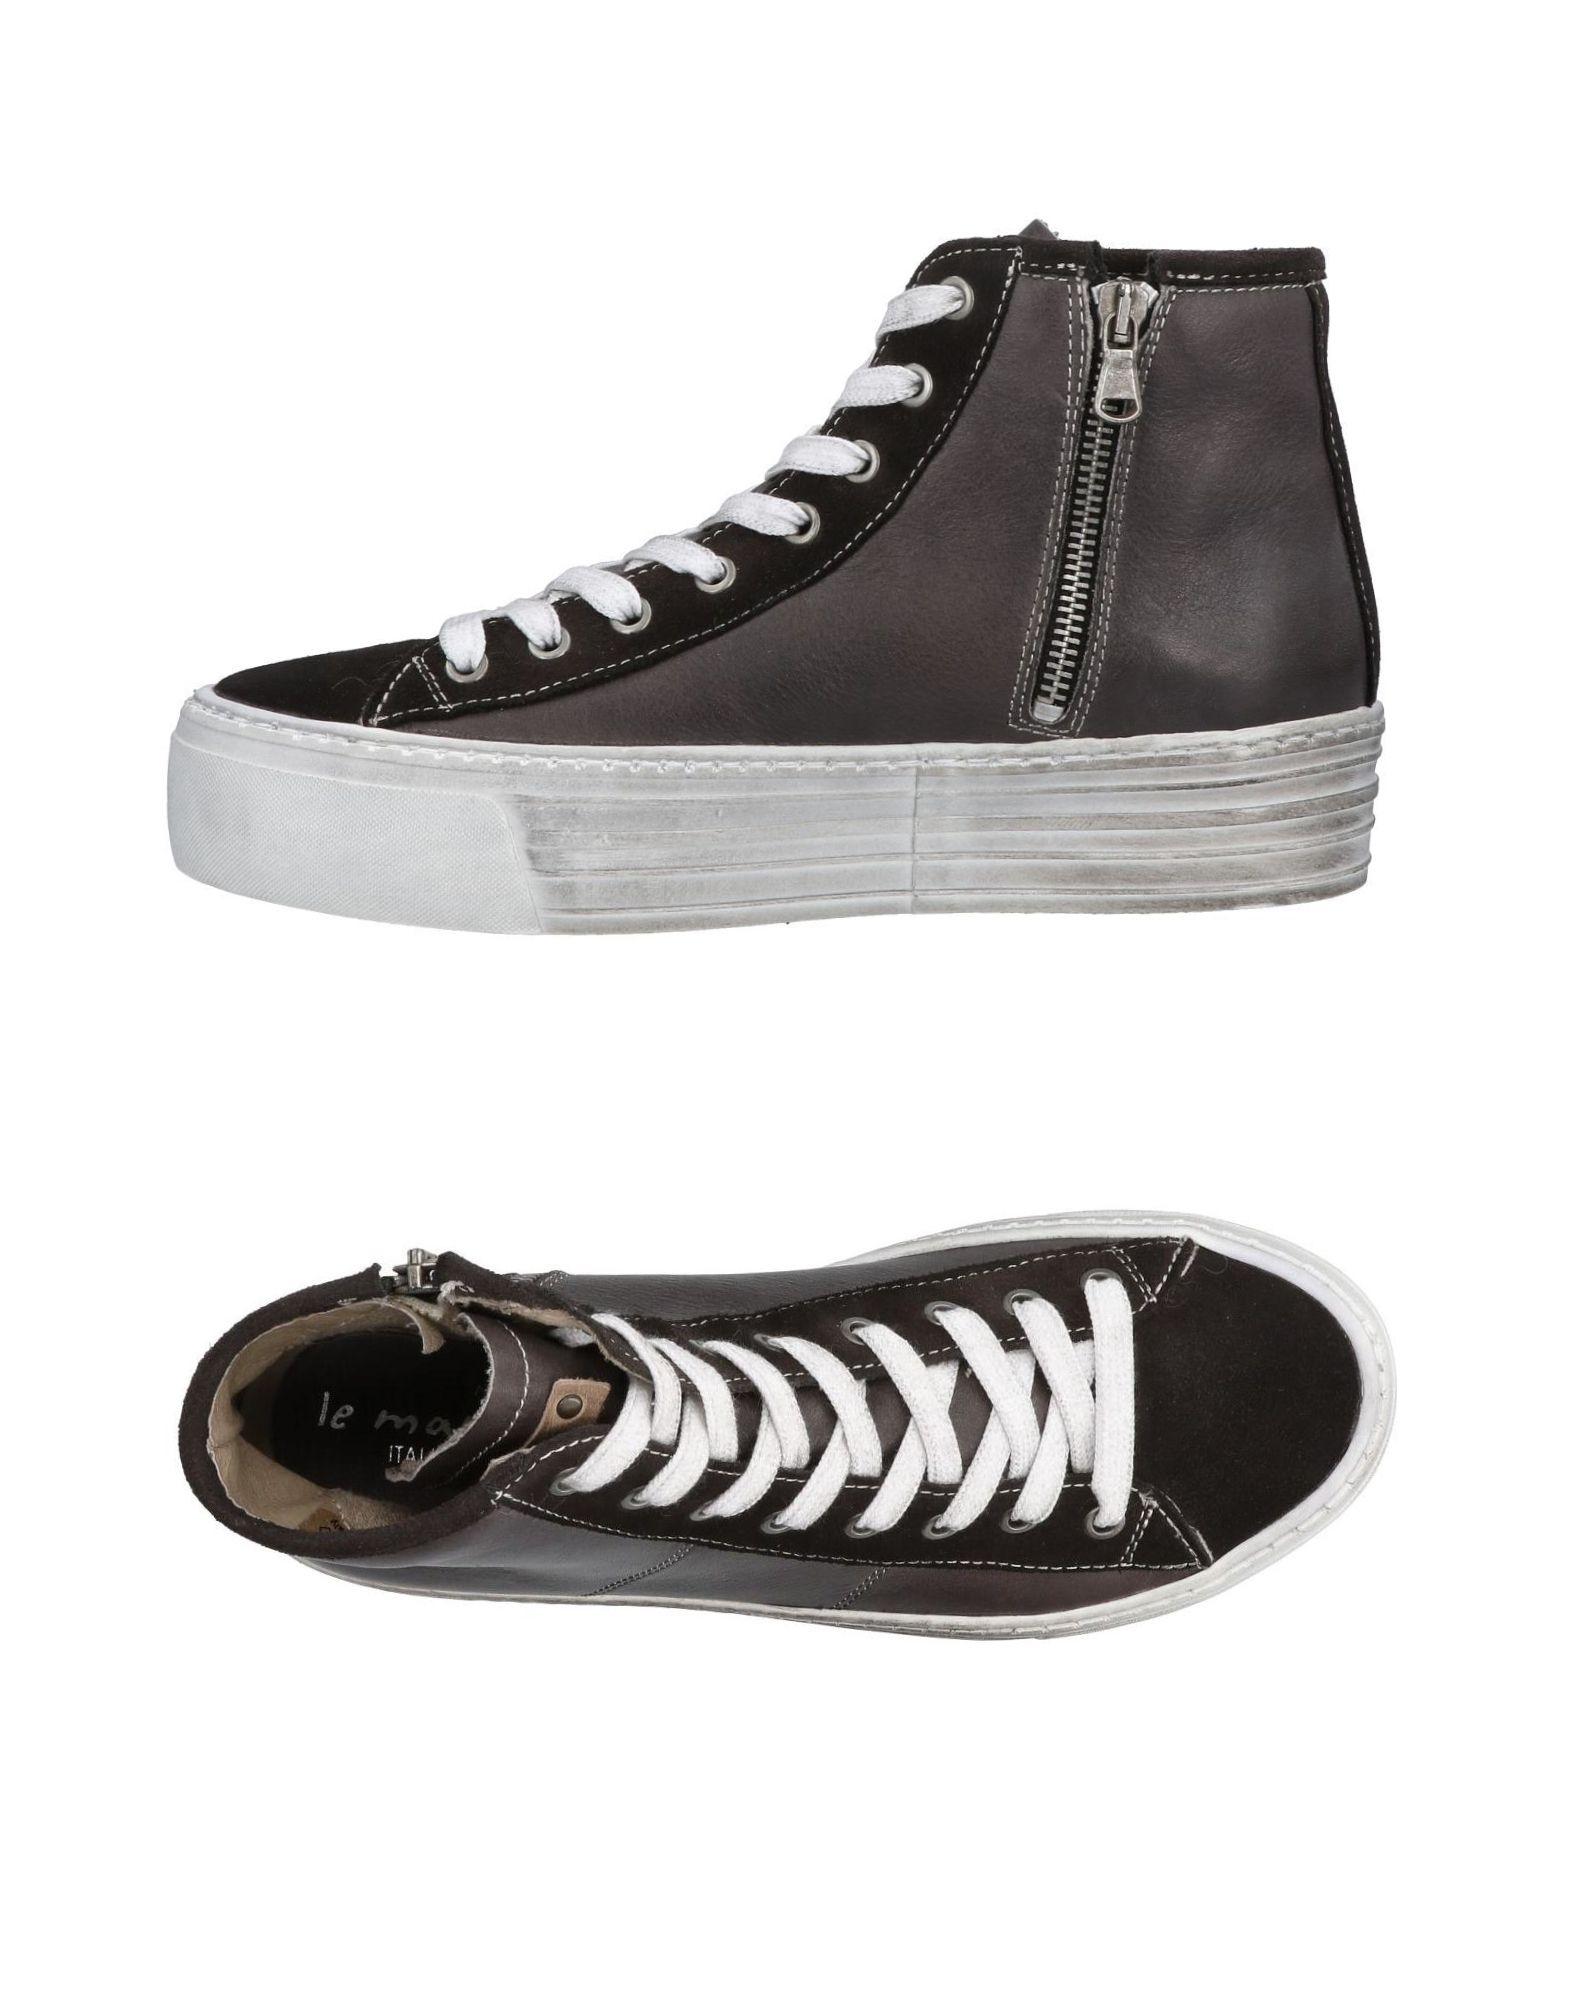 Sneakers Le Mamo Femme - Sneakers Le Mamo sur